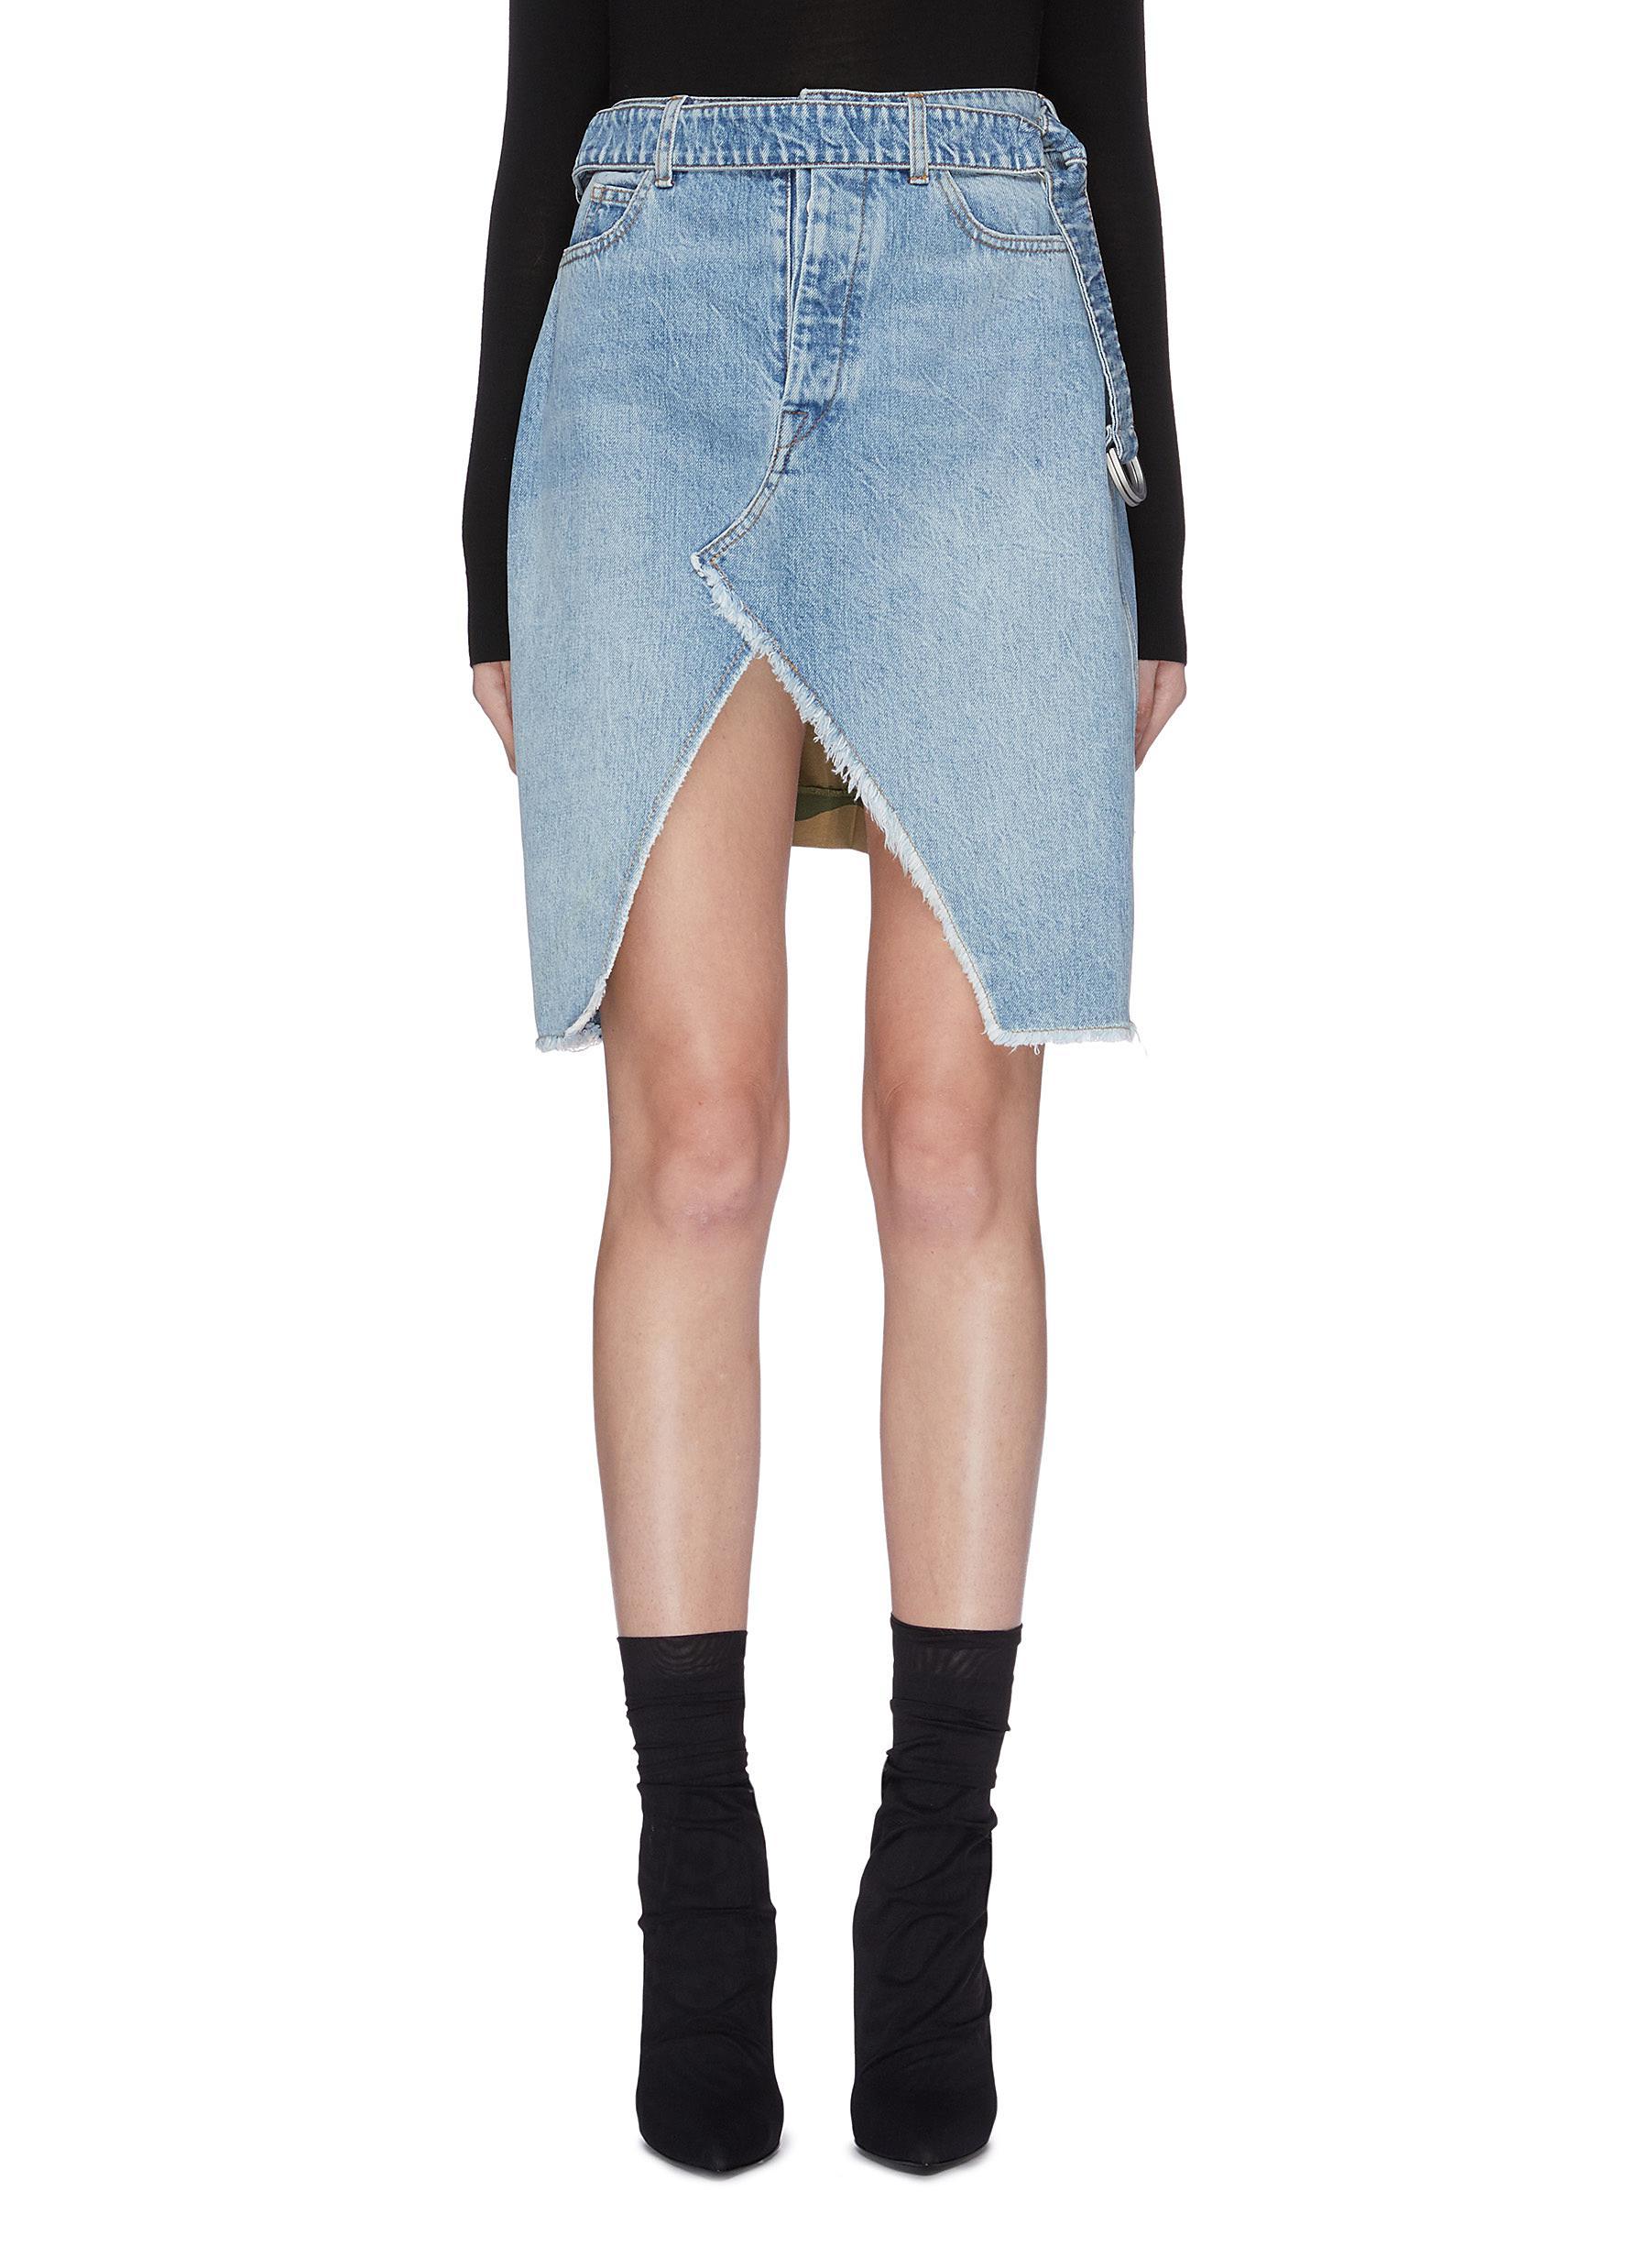 Belted split hem denim panel pleated camoflage skirt by Ben Taverniti Unravel Project